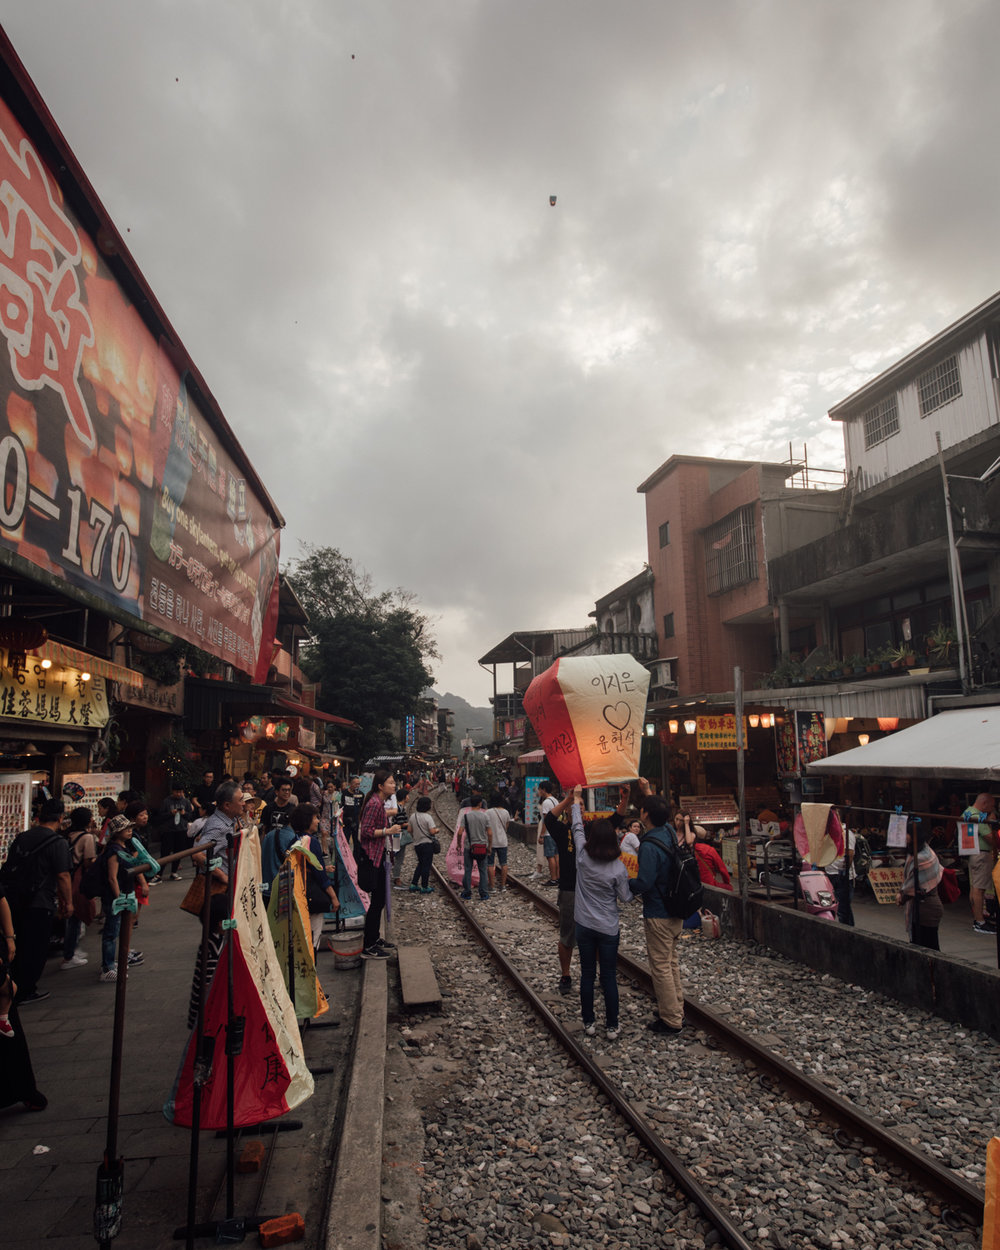 Shifen Lanterns - a tourist trap that creates trash everywhere